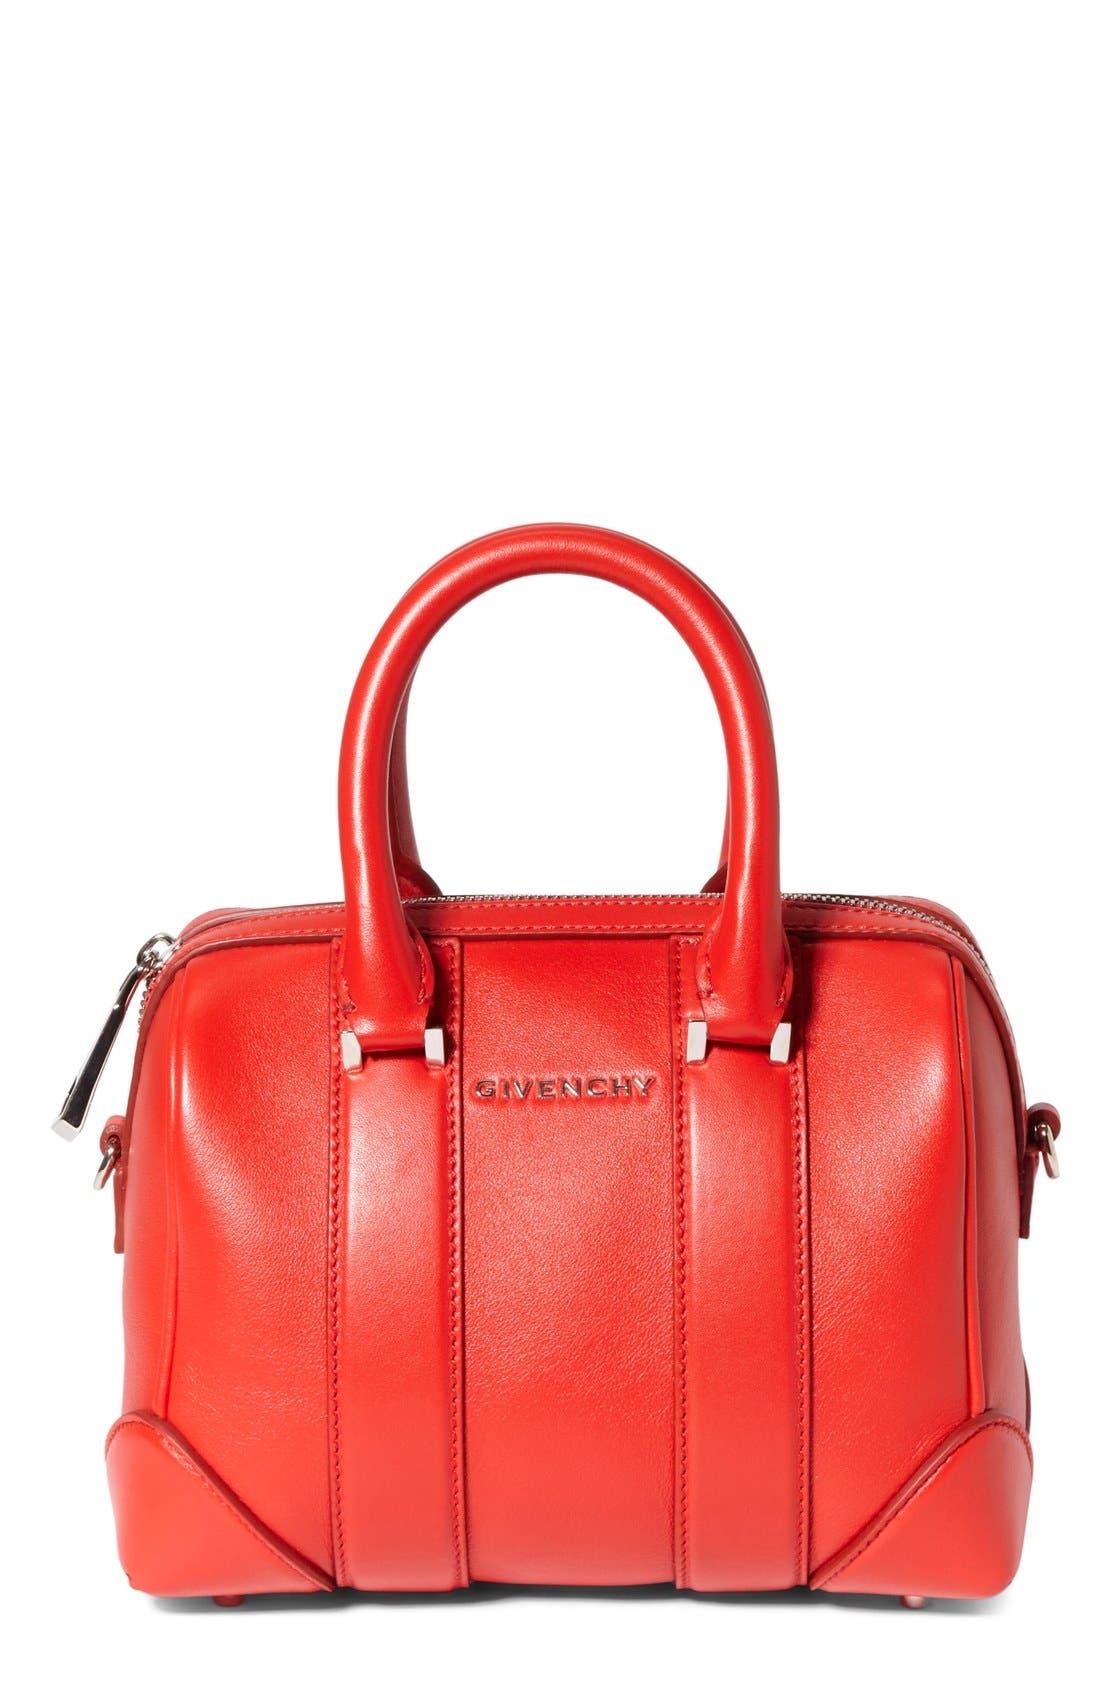 Main Image - Givenchy 'Micro Lucrezia Sandy' Leather Satchel